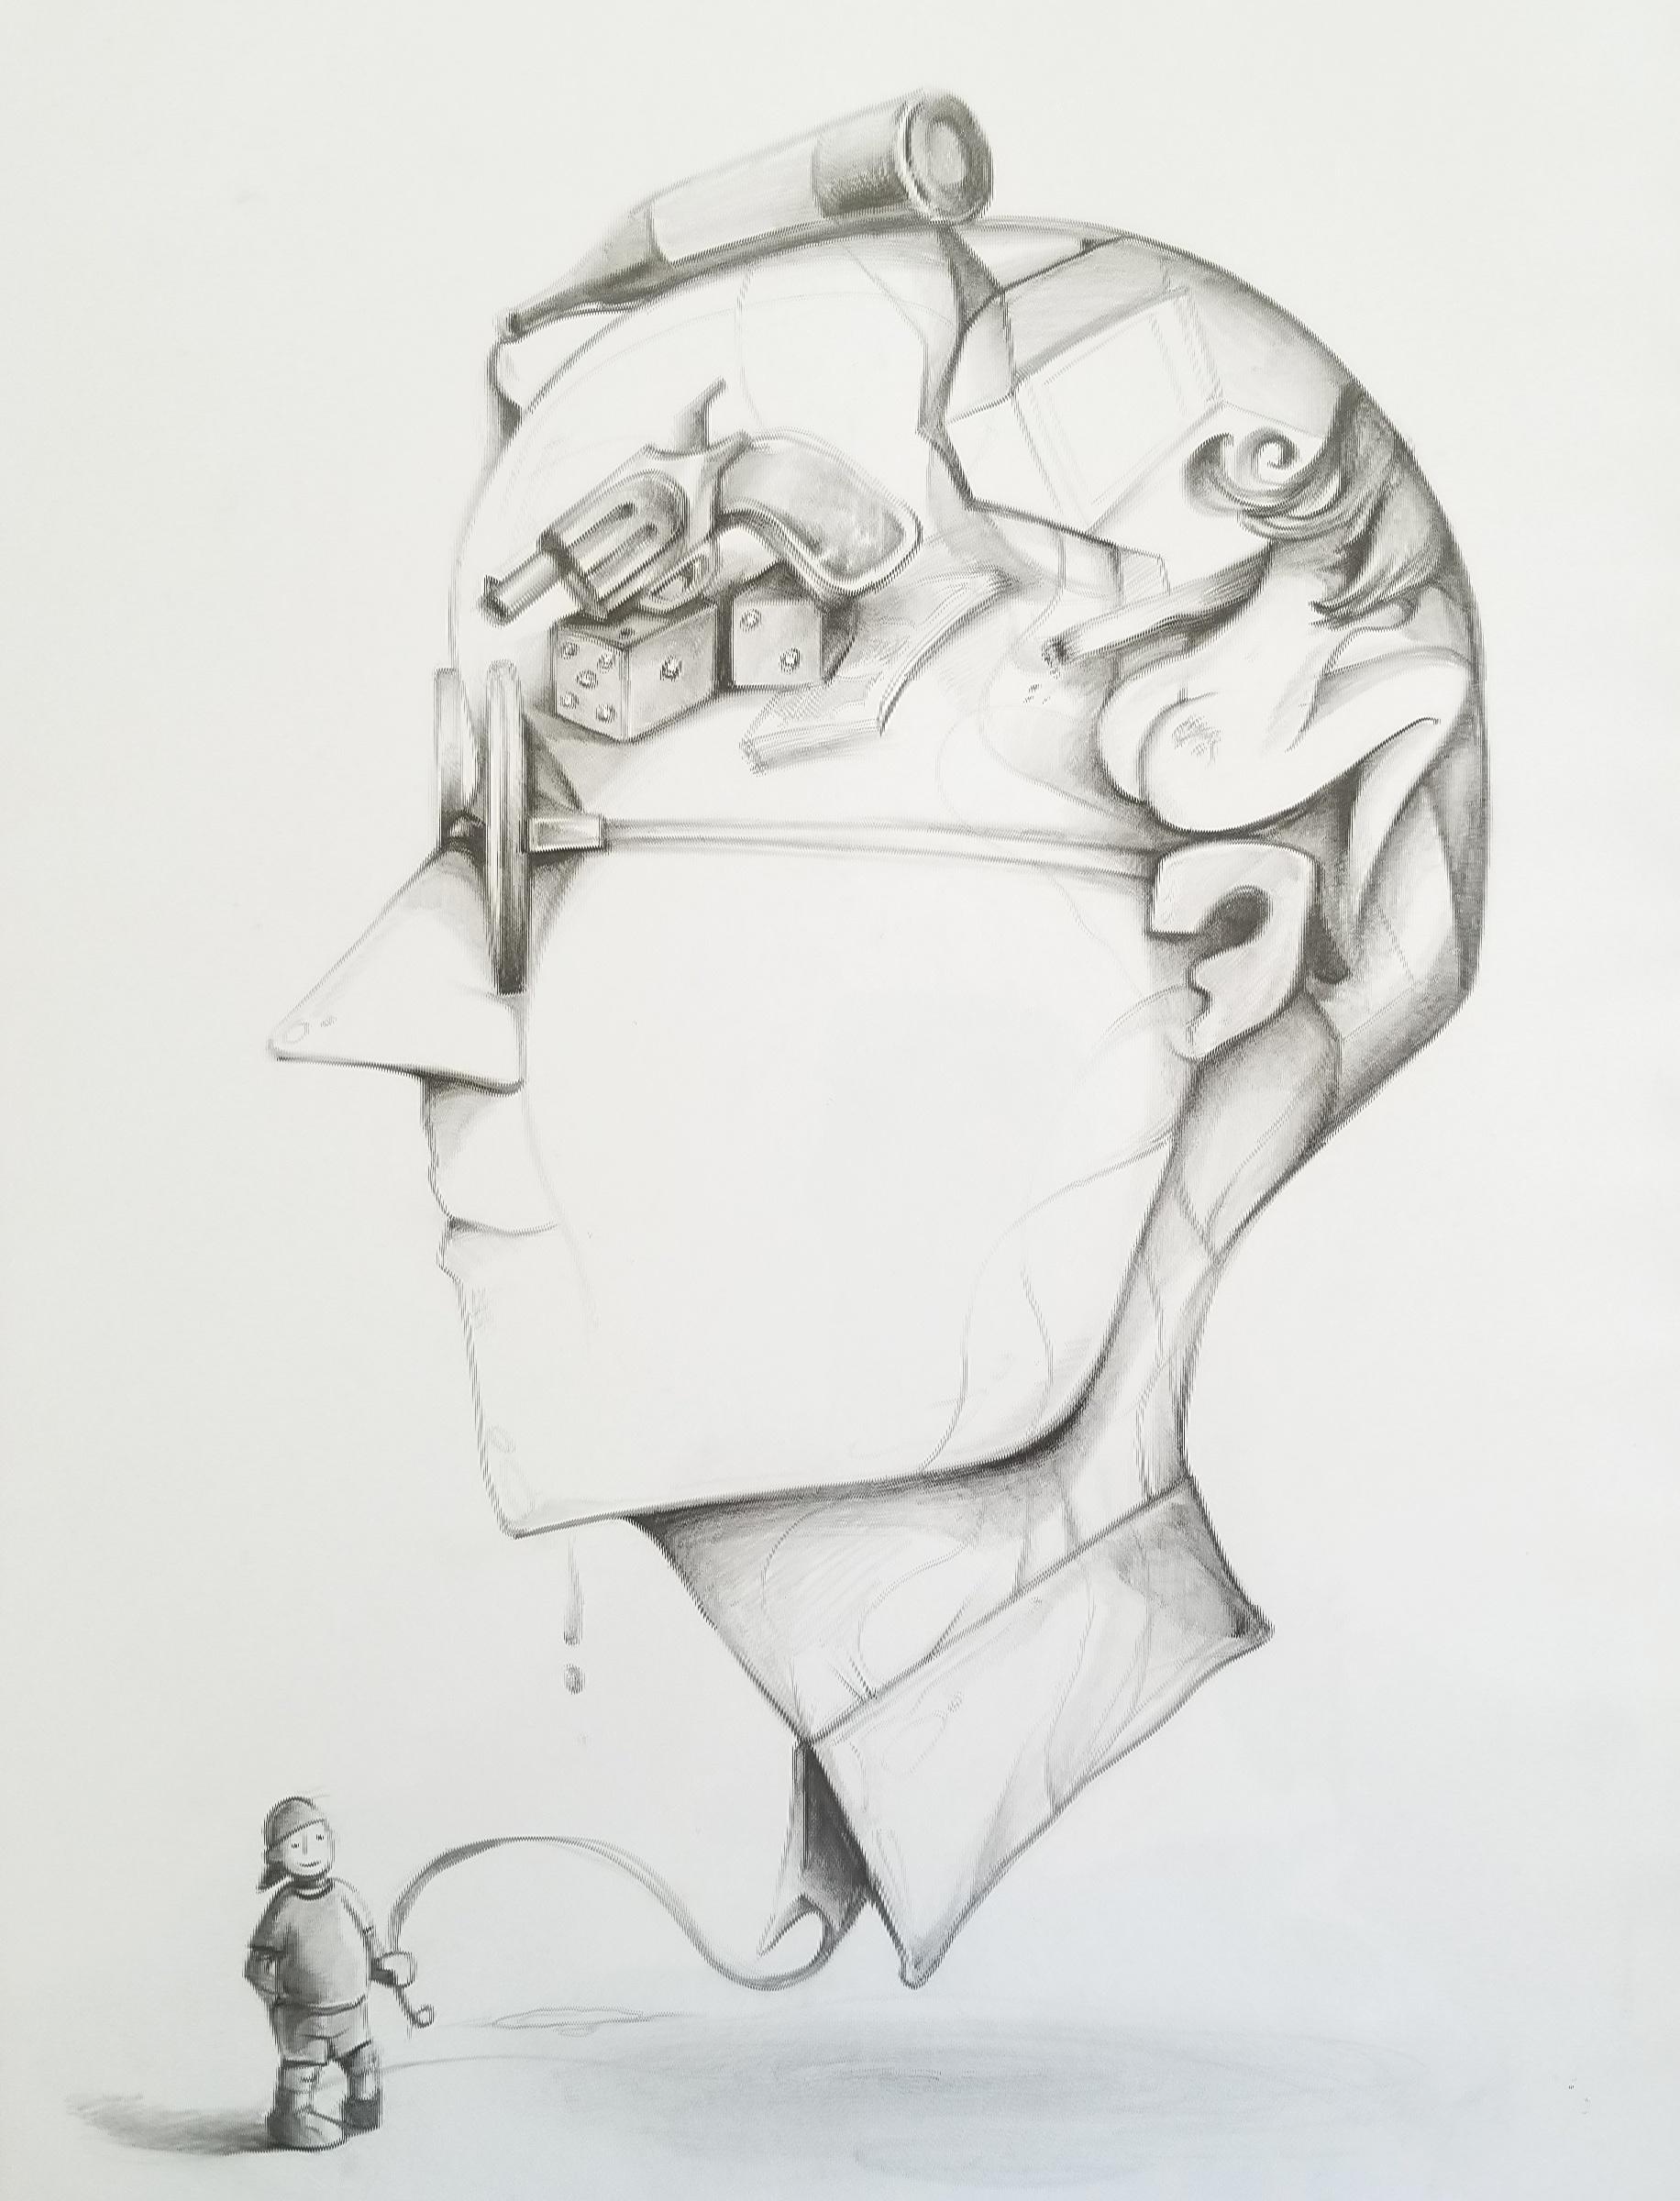 """Temptations"" / Graphite pencil on paper / 11 x 14"